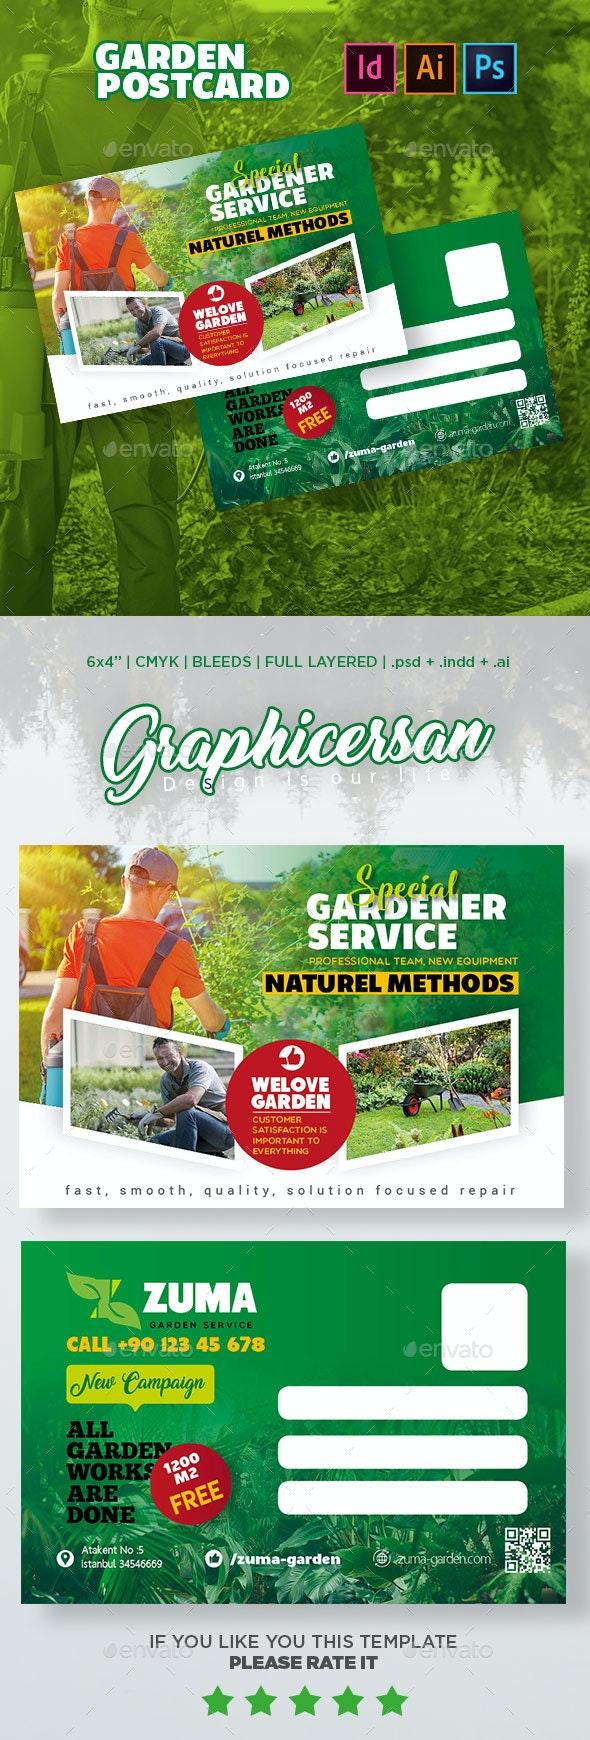 Garden Postcard Templates - Cards & Invites Print Templates